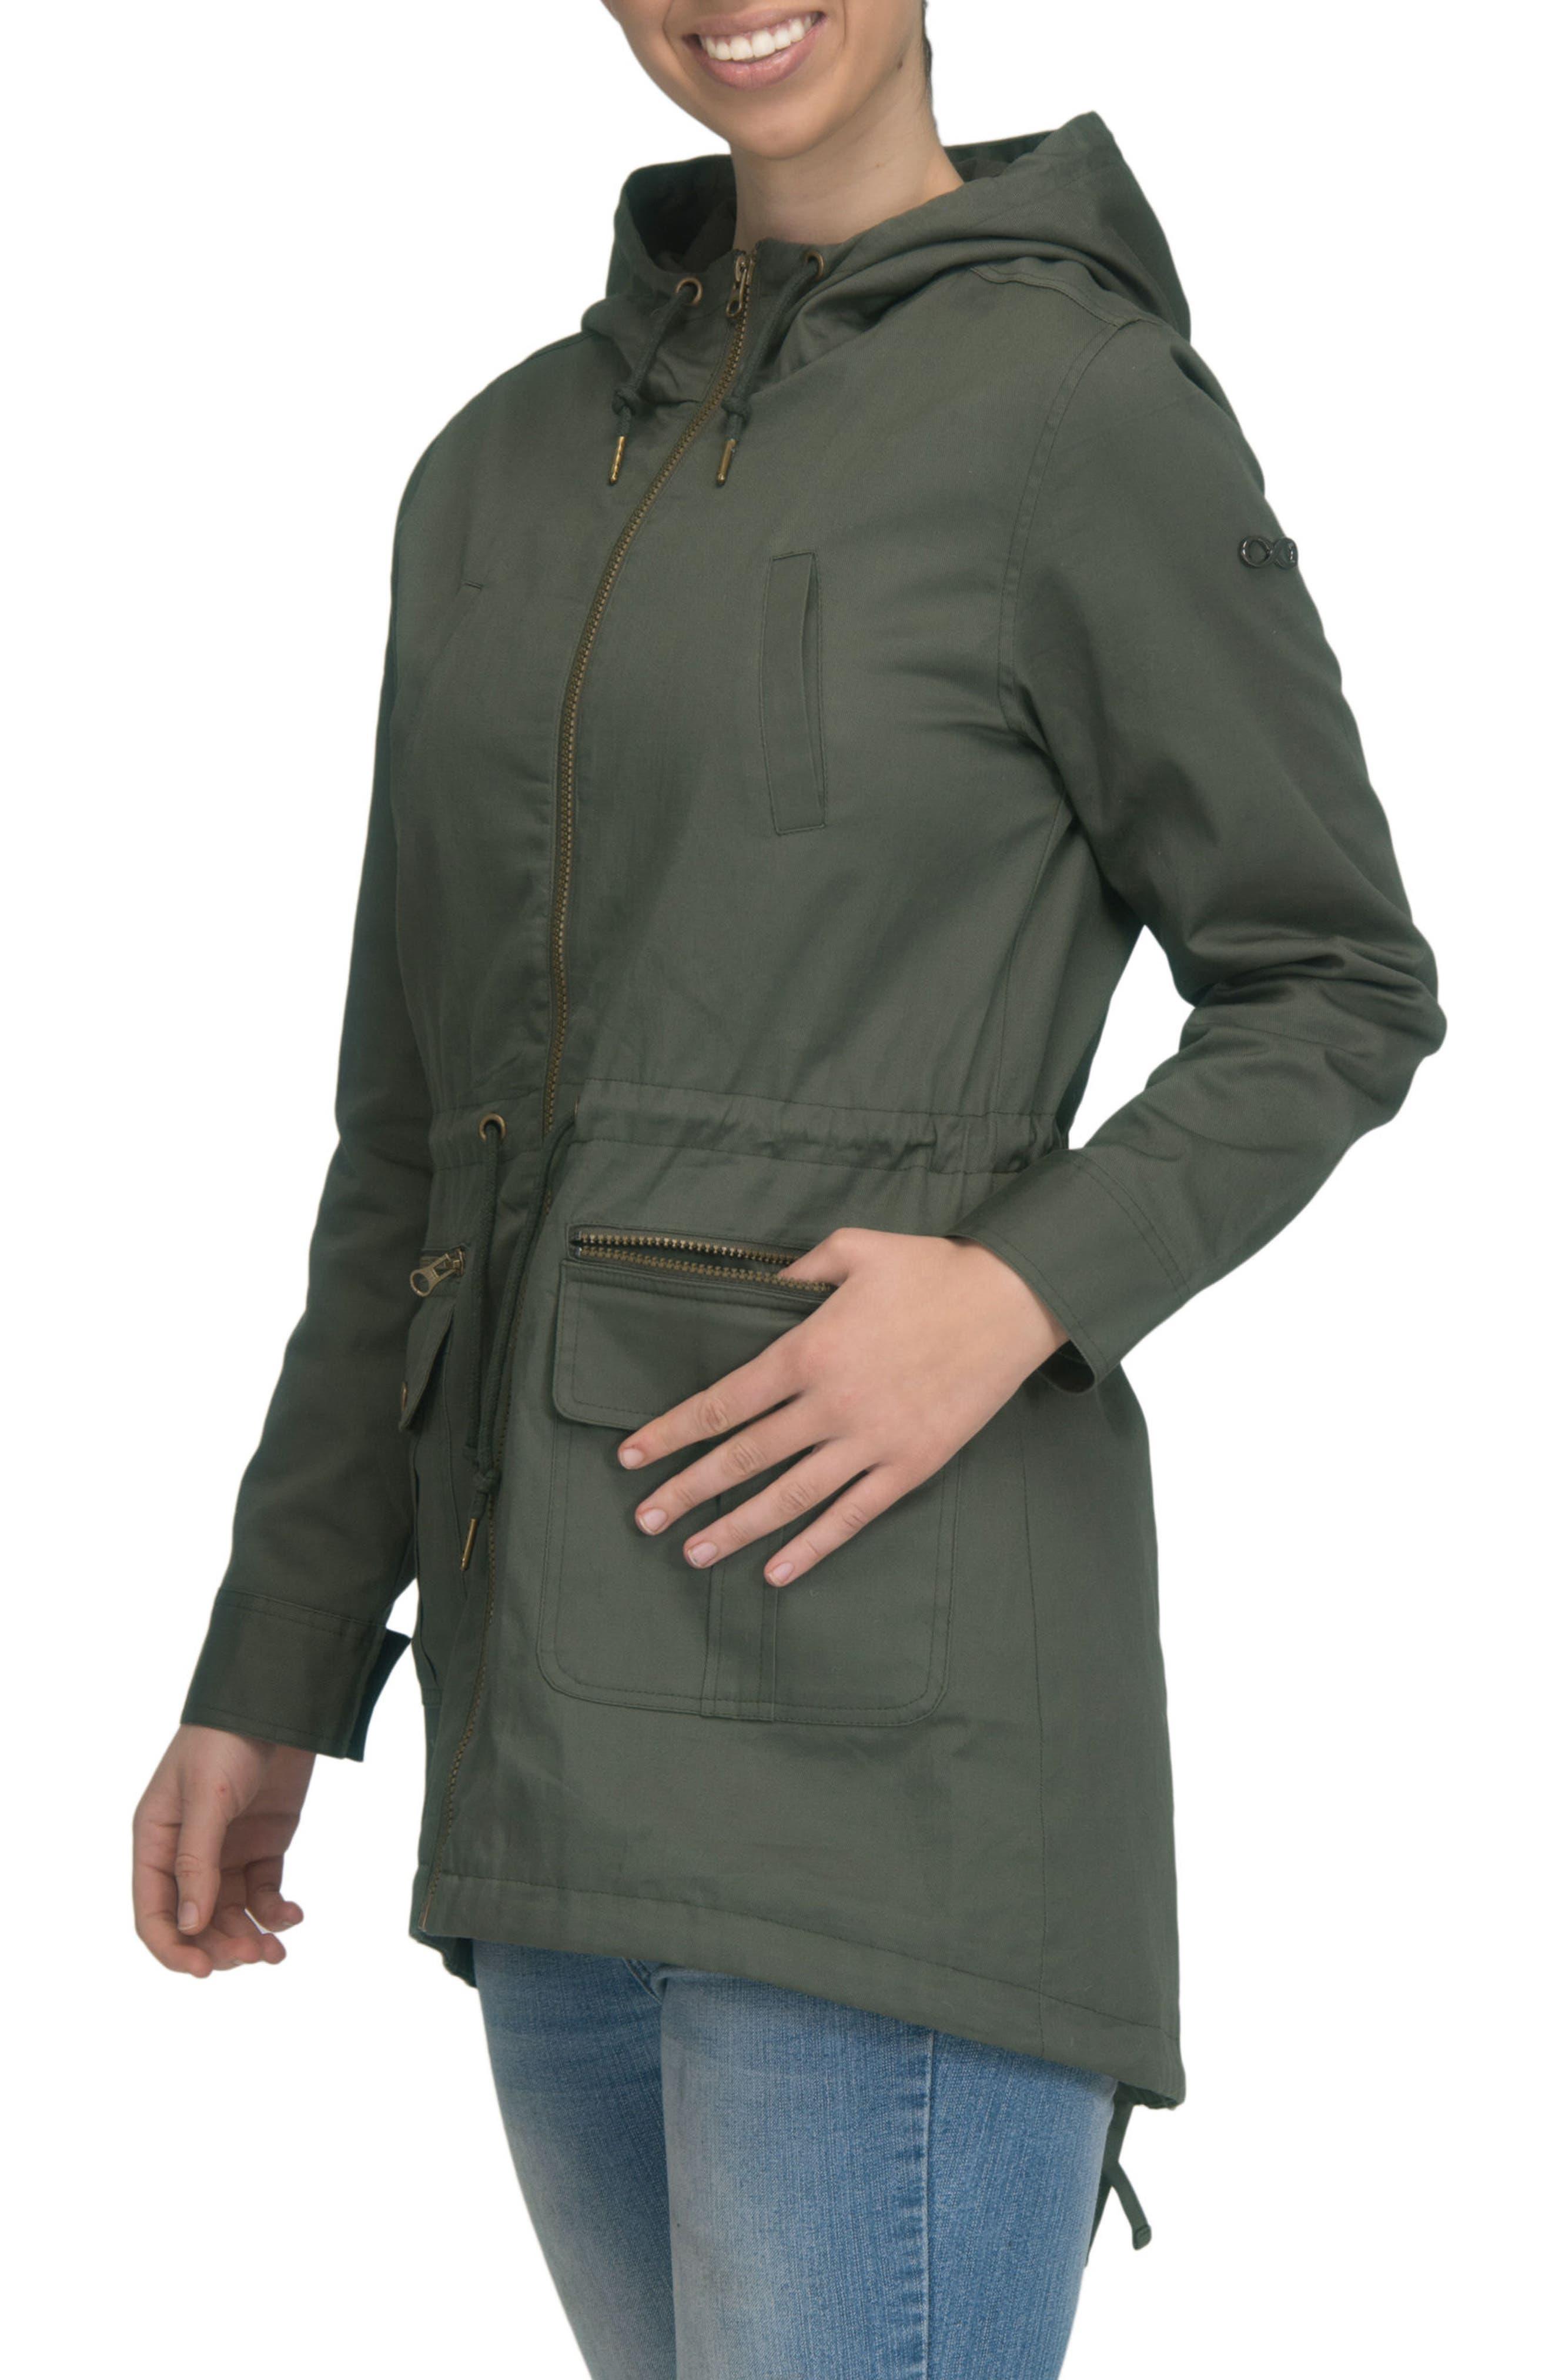 Convertible Military 3-in-1 Maternity/Nursing Jacket,                             Alternate thumbnail 5, color,                             KHAKI GREEN